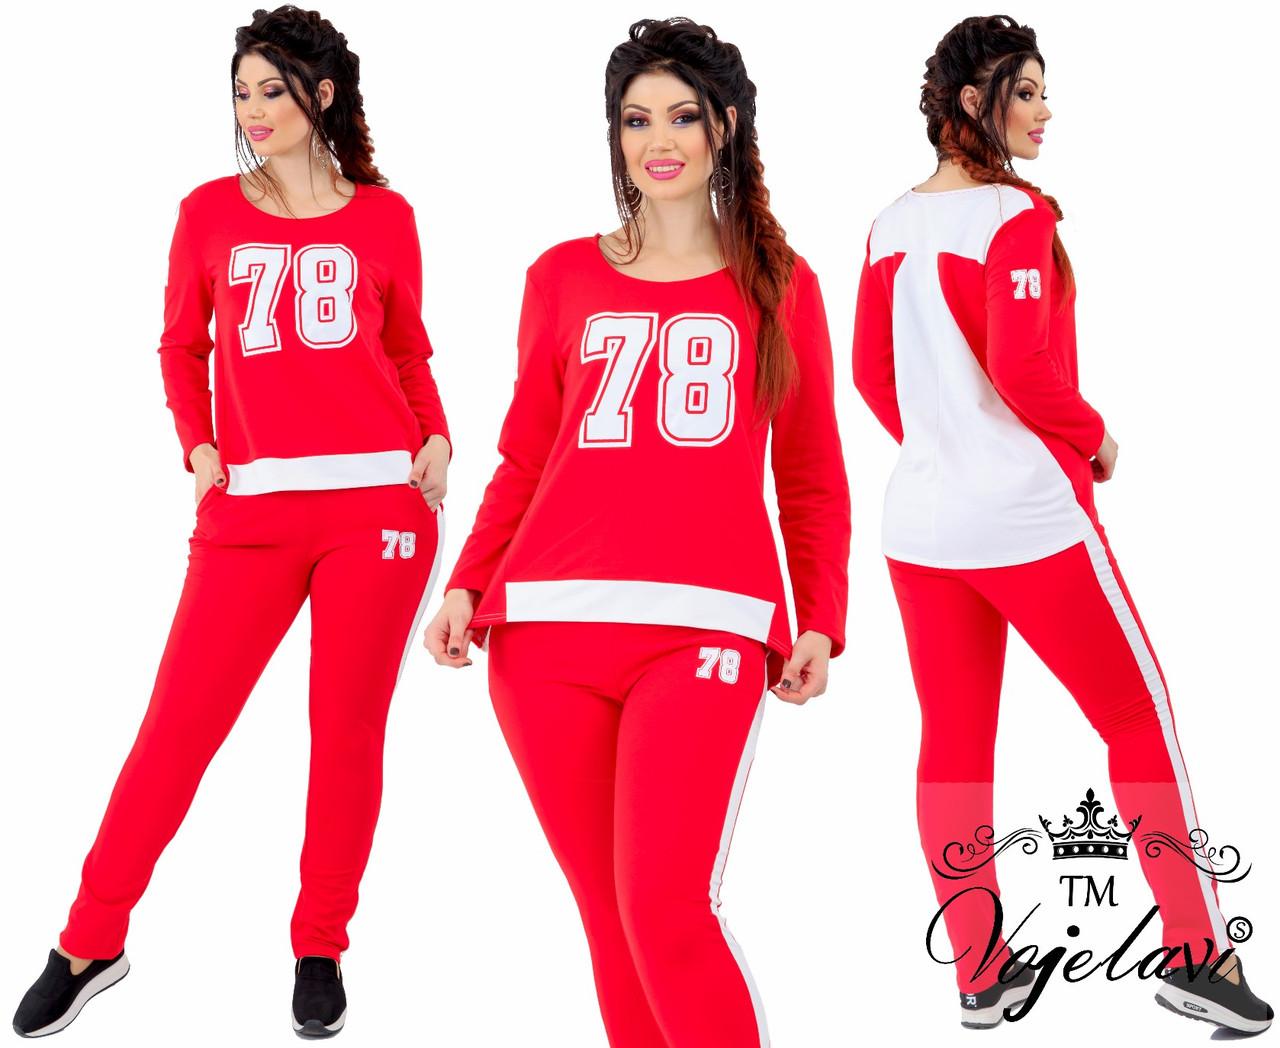 a33bc4e2bedae Женский спортивный костюм